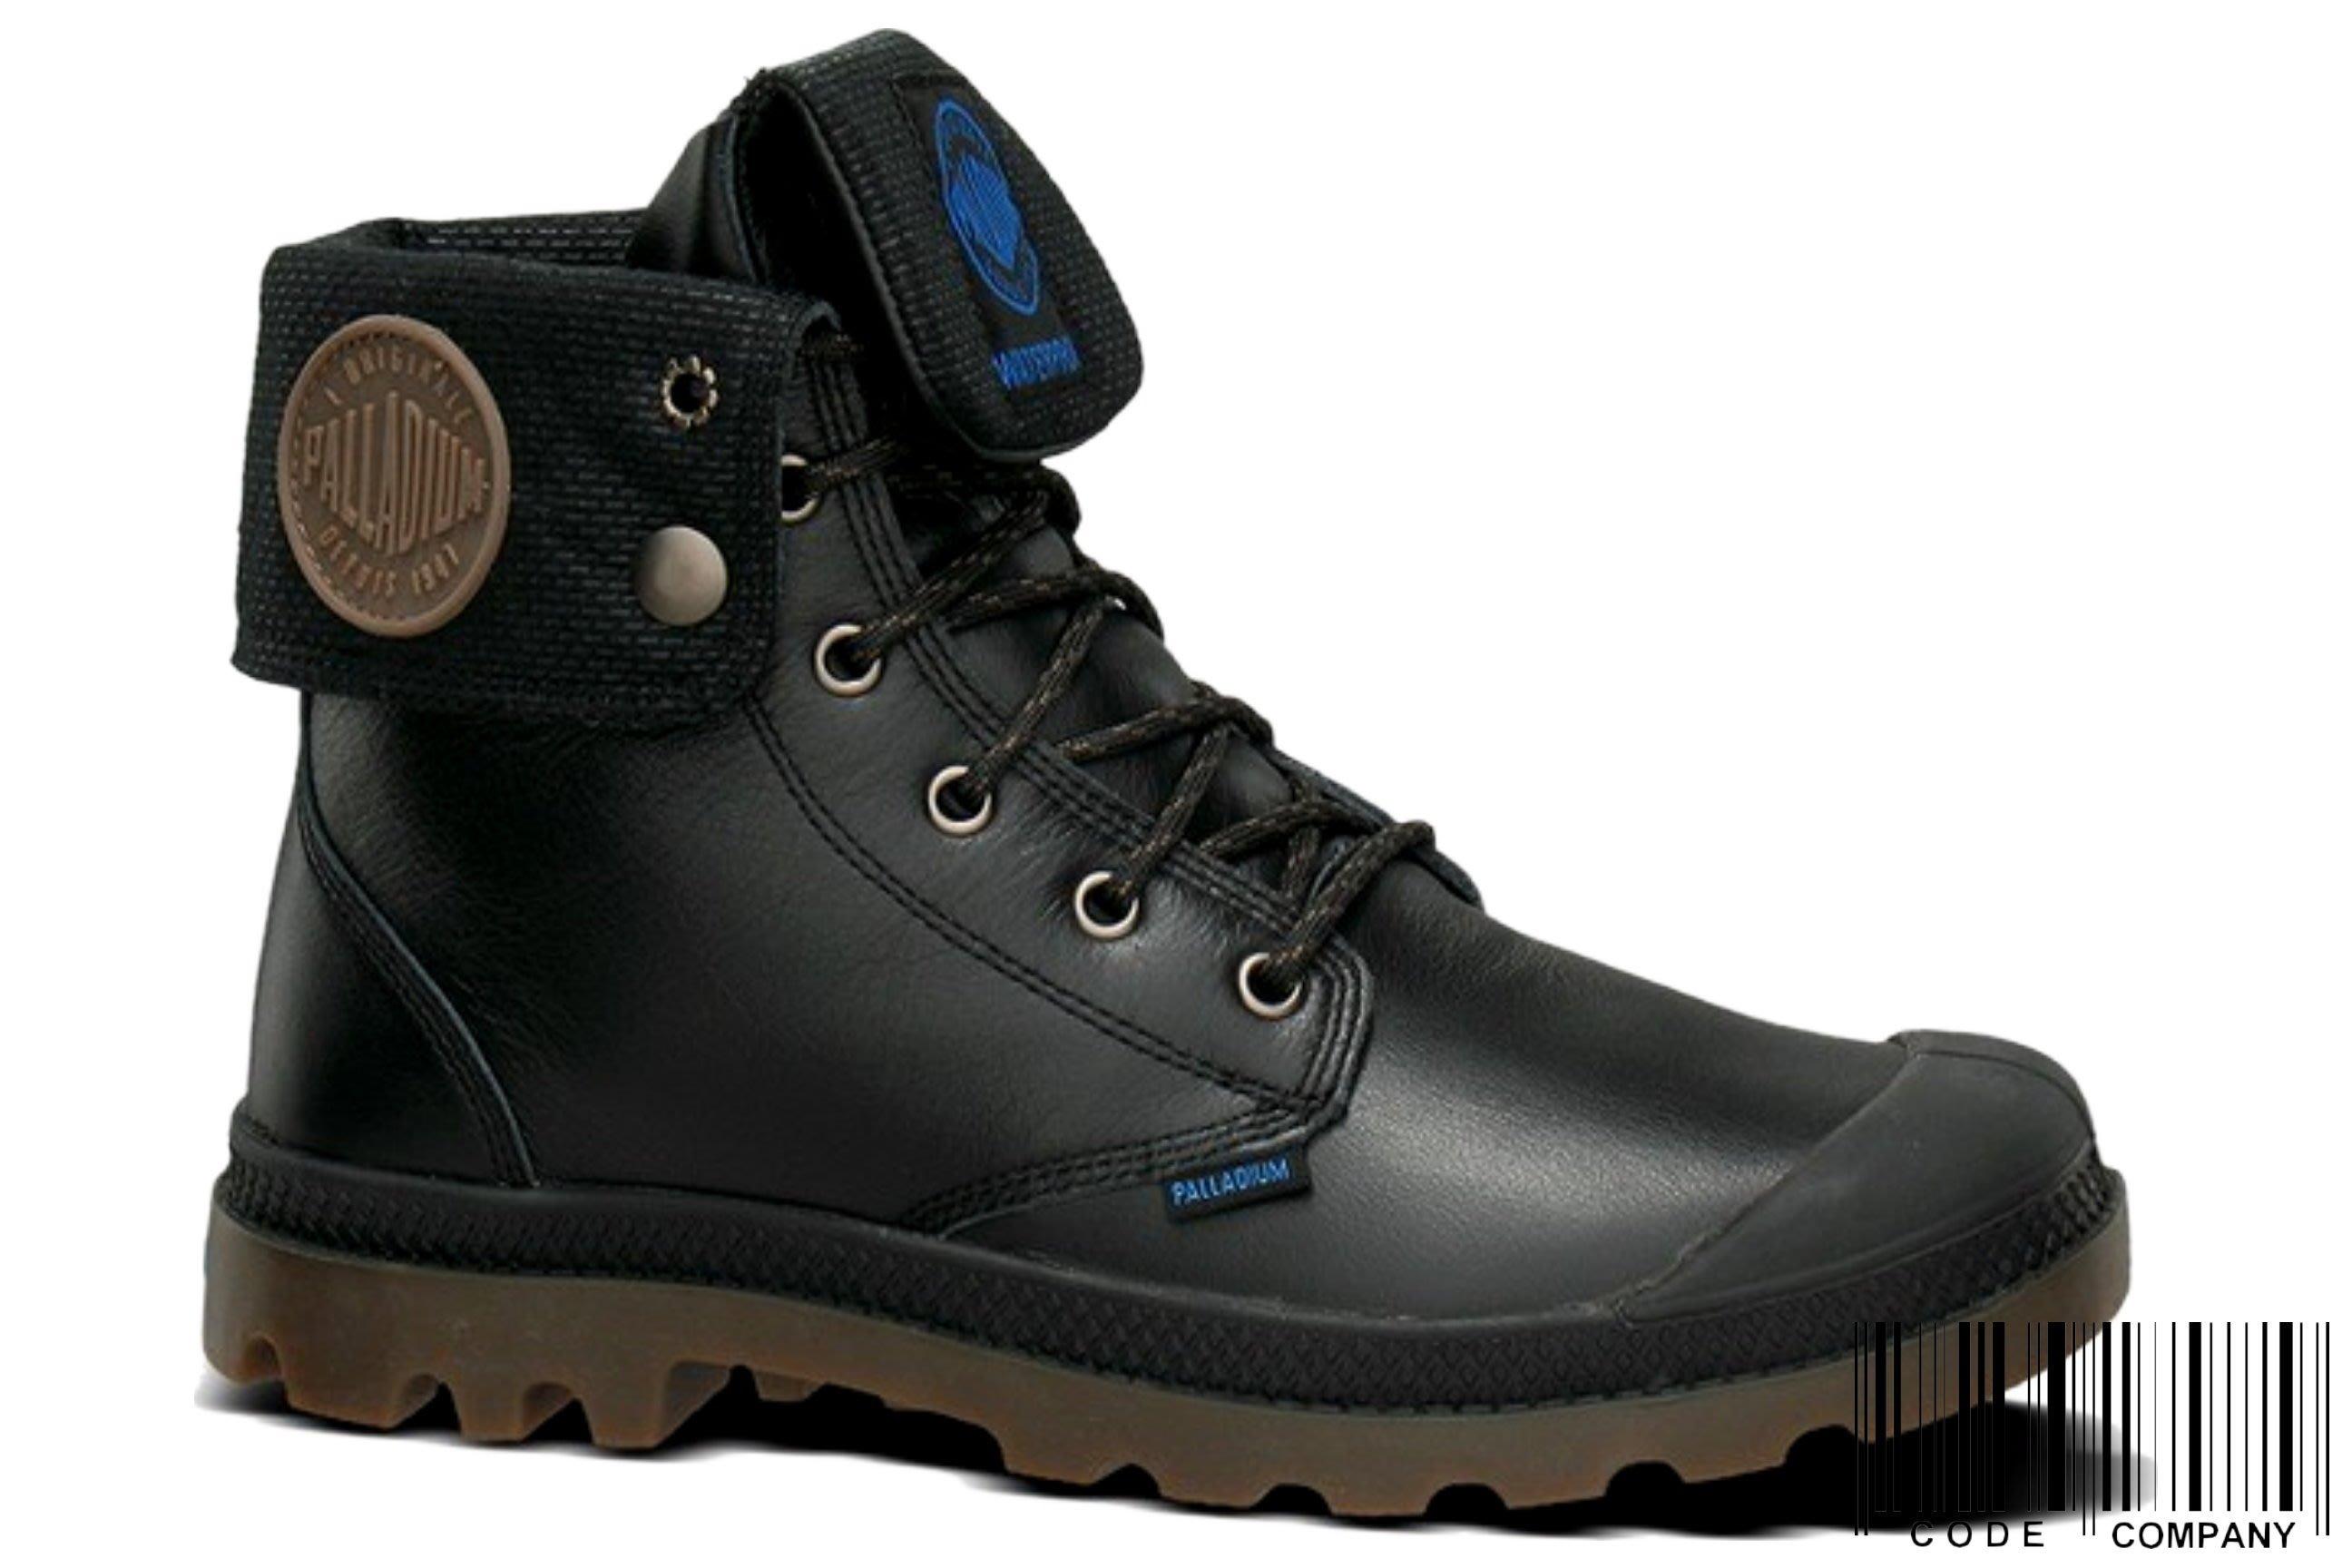 =CodE= PALLADIUM PAMPA SPORT BAGGY WP 防水皮革反折軍靴(黑)72963-057 女